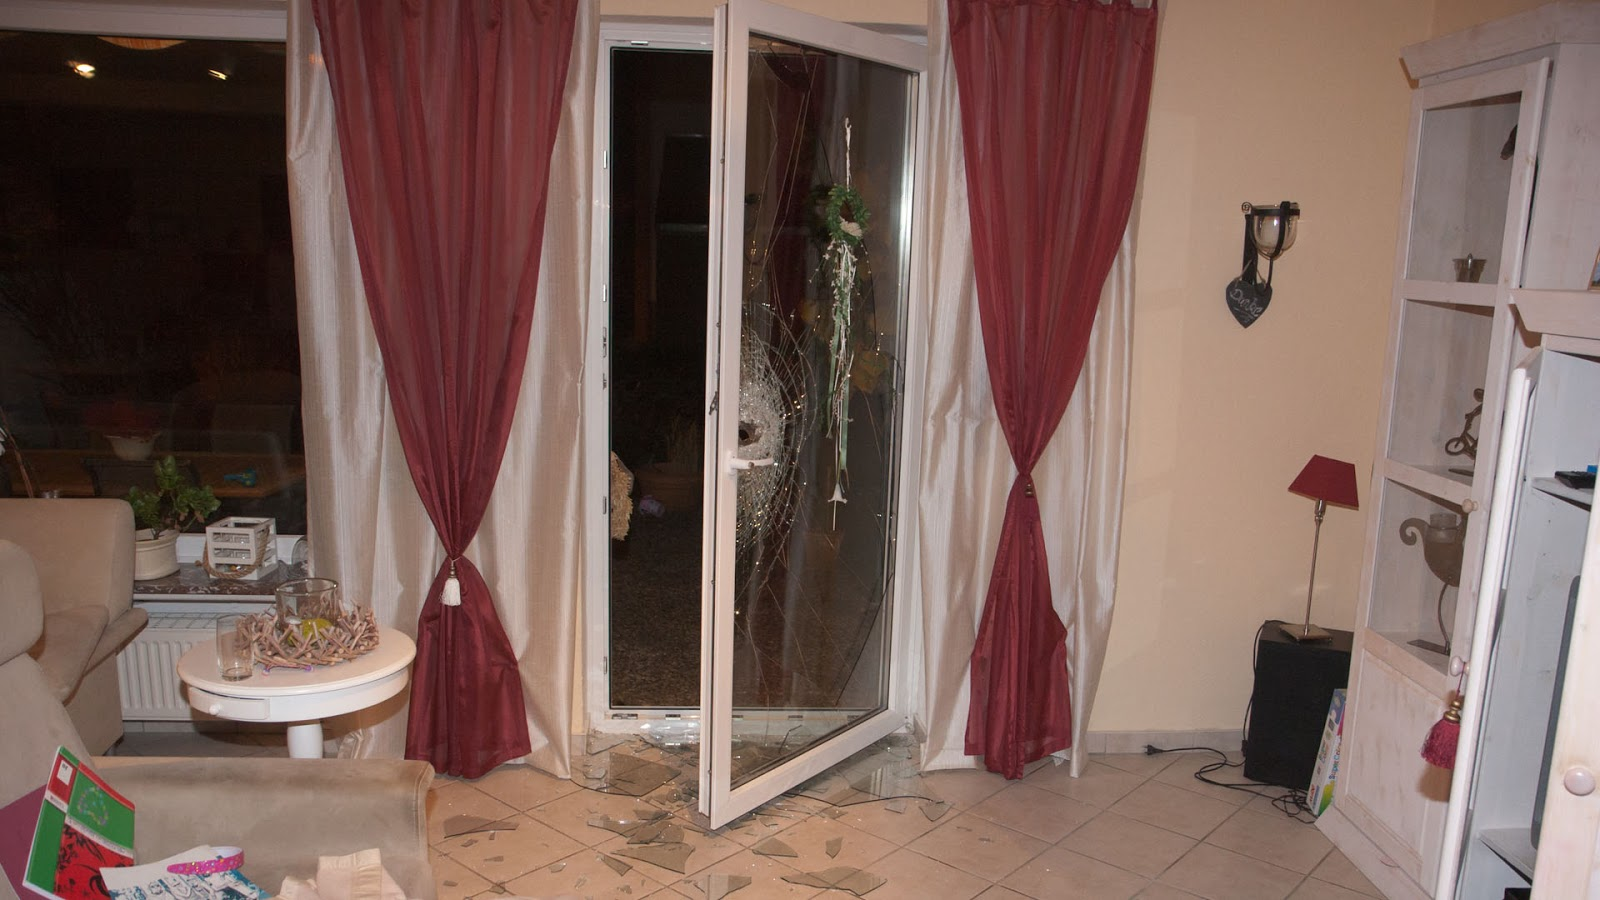 gekipptes fenster von au en ffnen. Black Bedroom Furniture Sets. Home Design Ideas